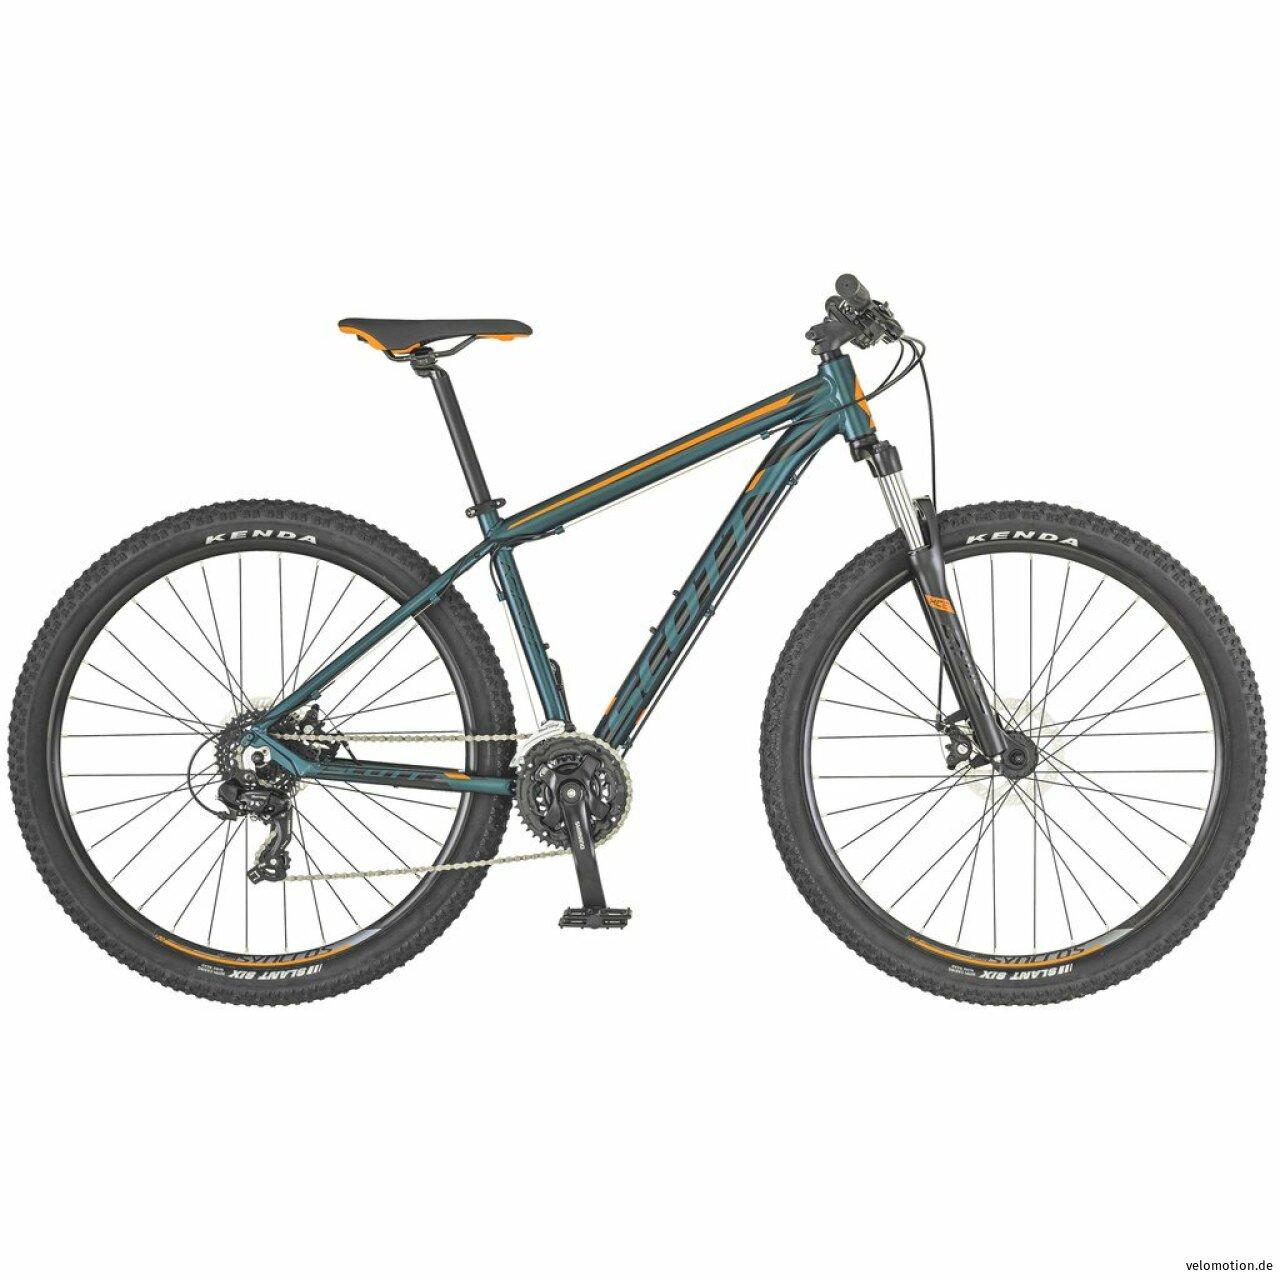 Zweirad Stadler Amberg